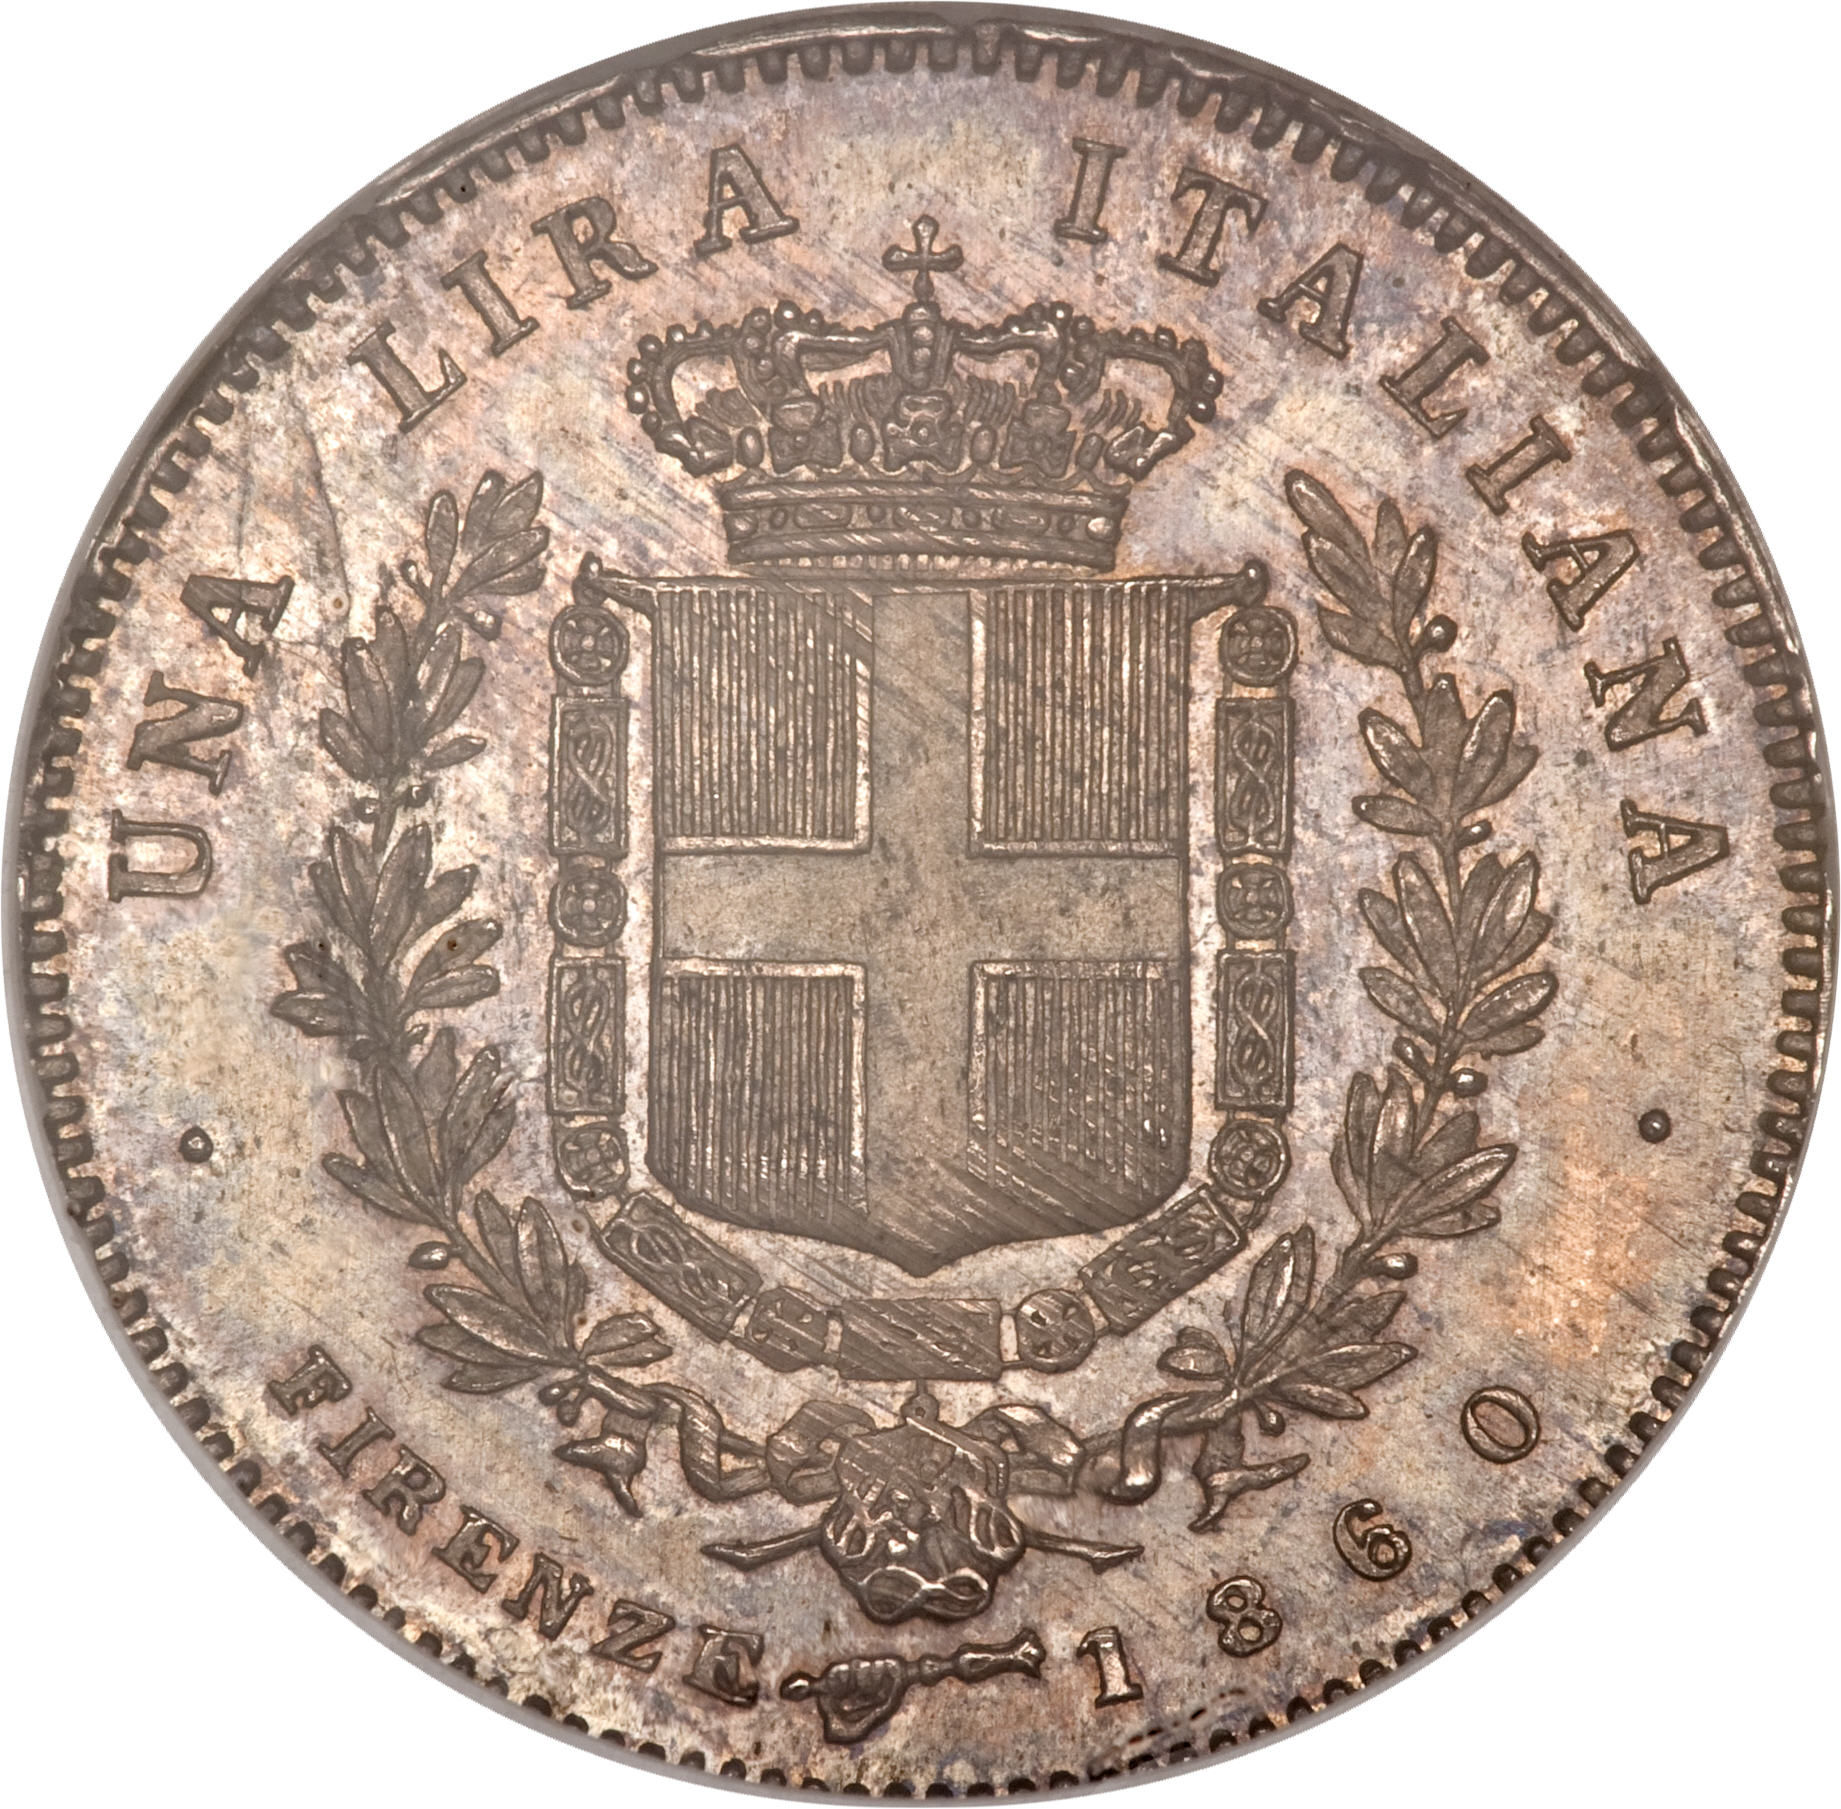 Lira - Vittorio Emanuele II - Italian states – Numista